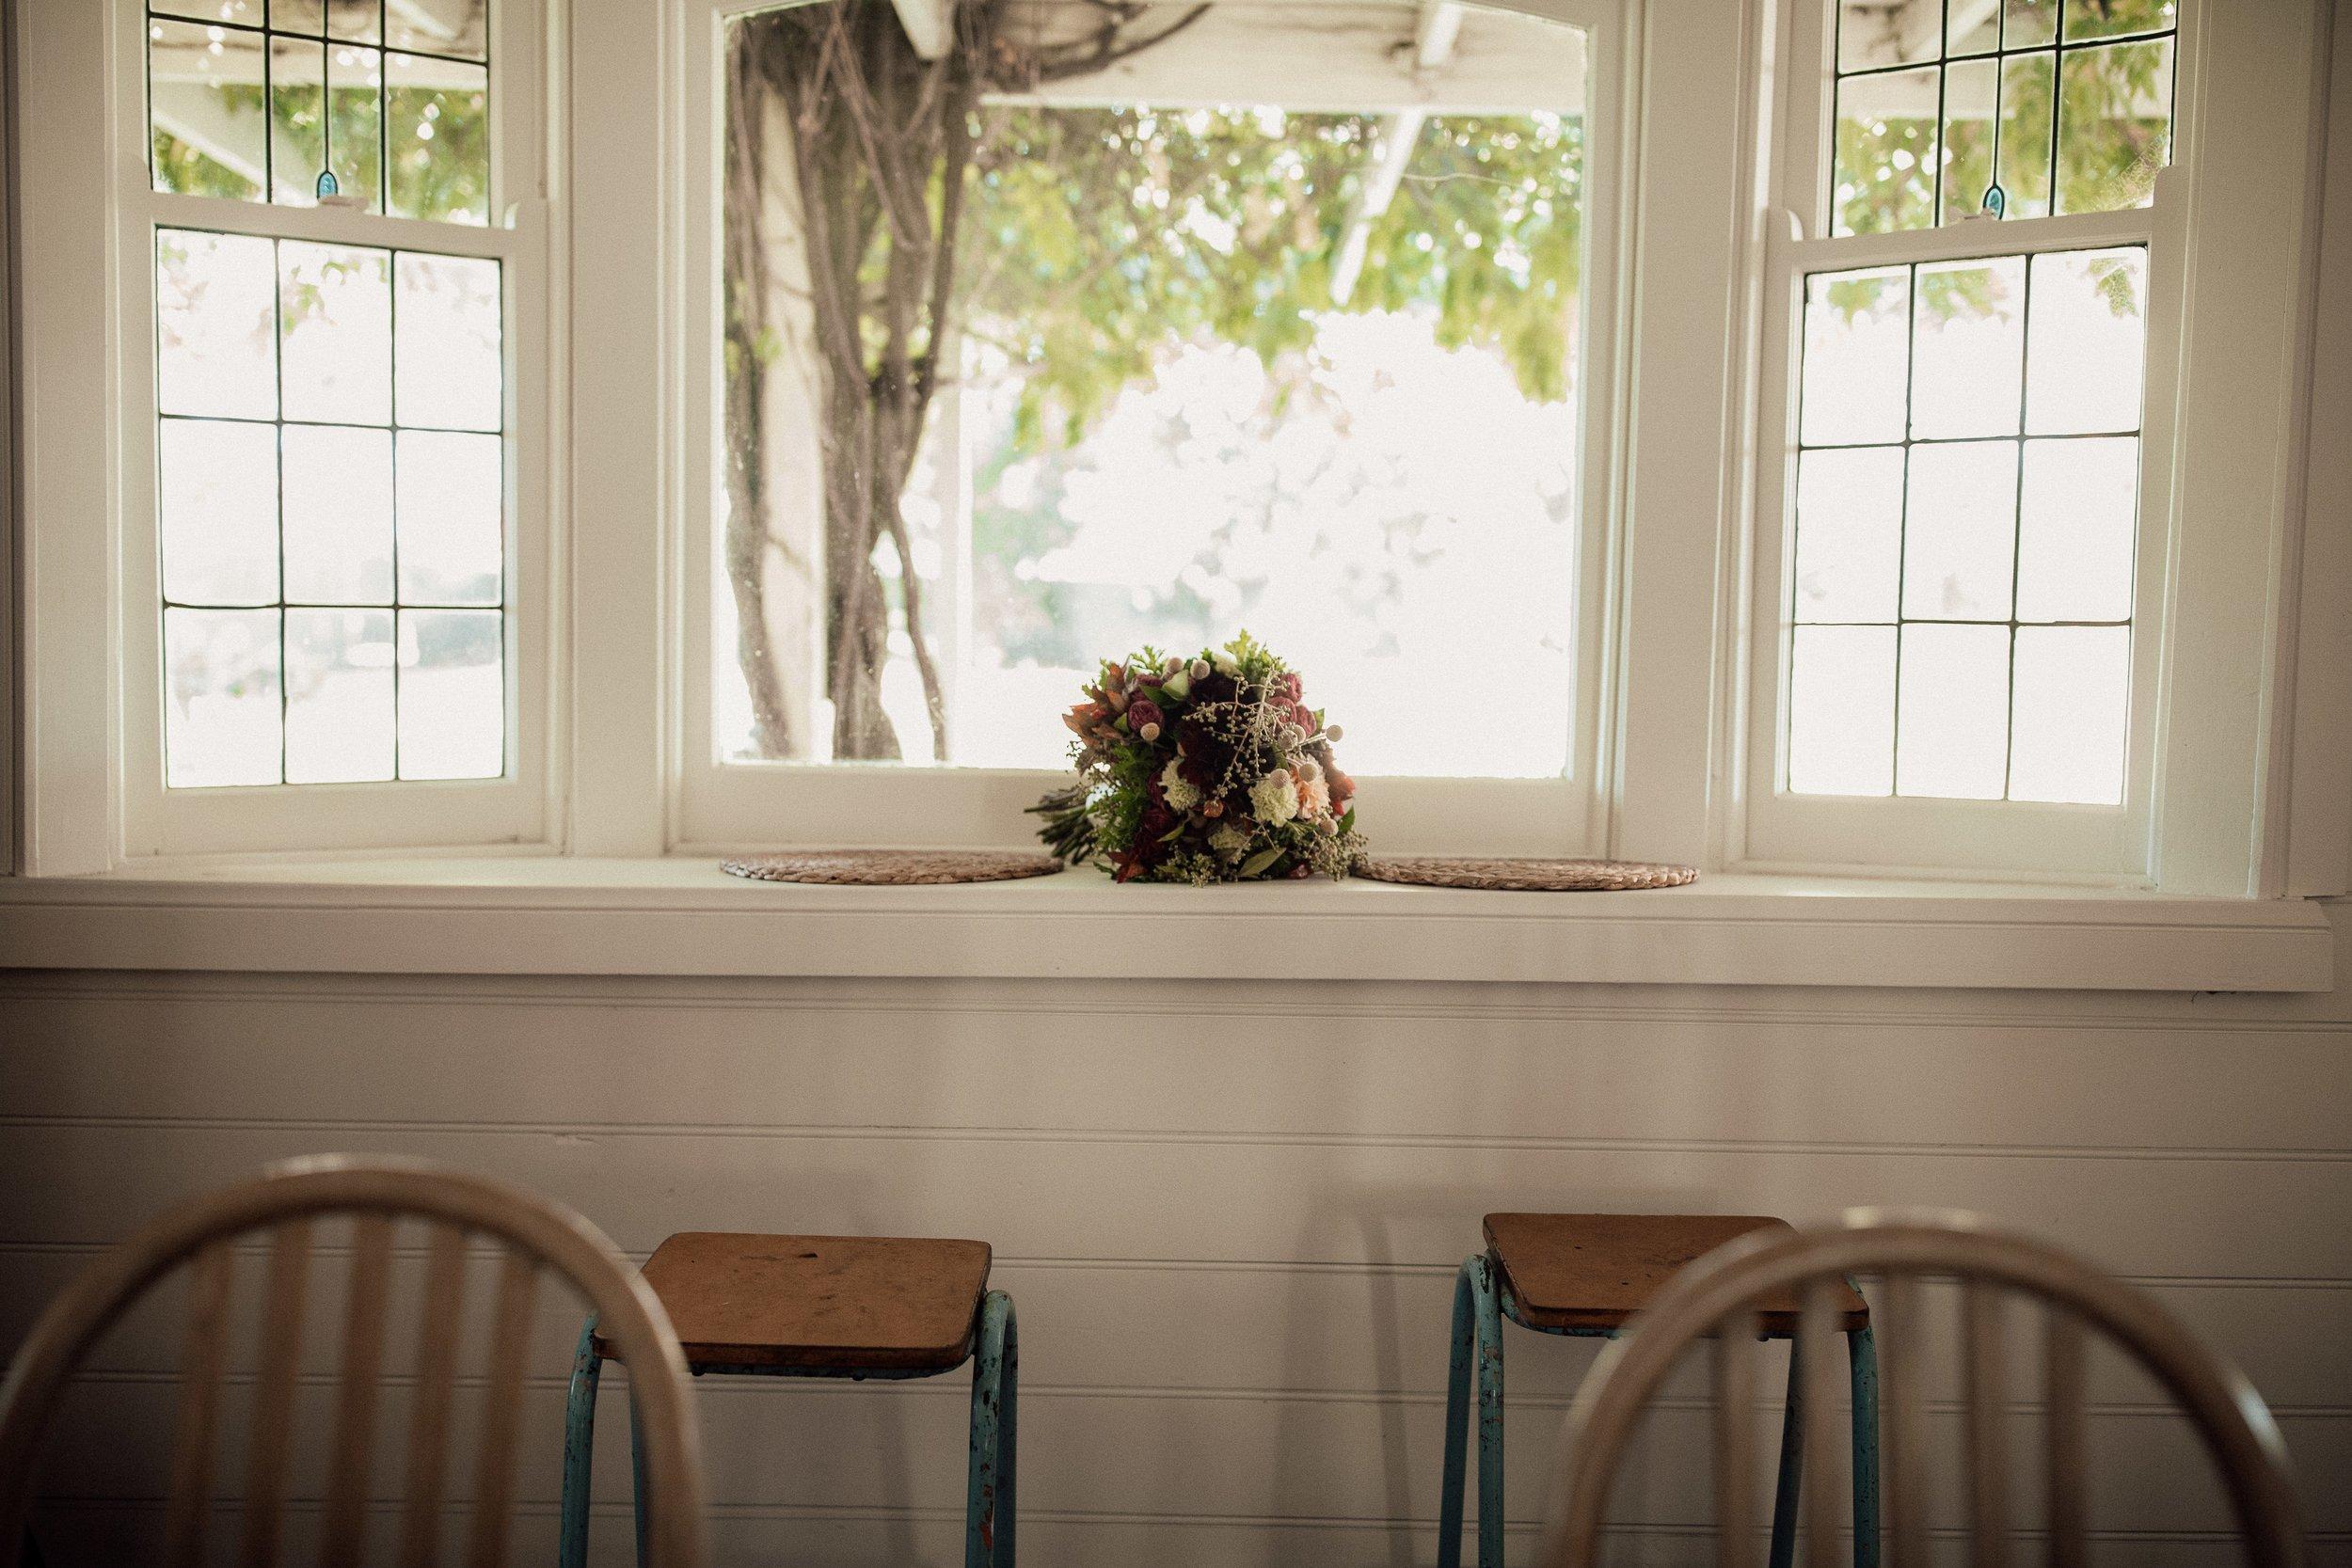 mickalathomas_puremacphotography_weddingphotographer_couplephotographer_Sheppartonphotographer_2116.jpg